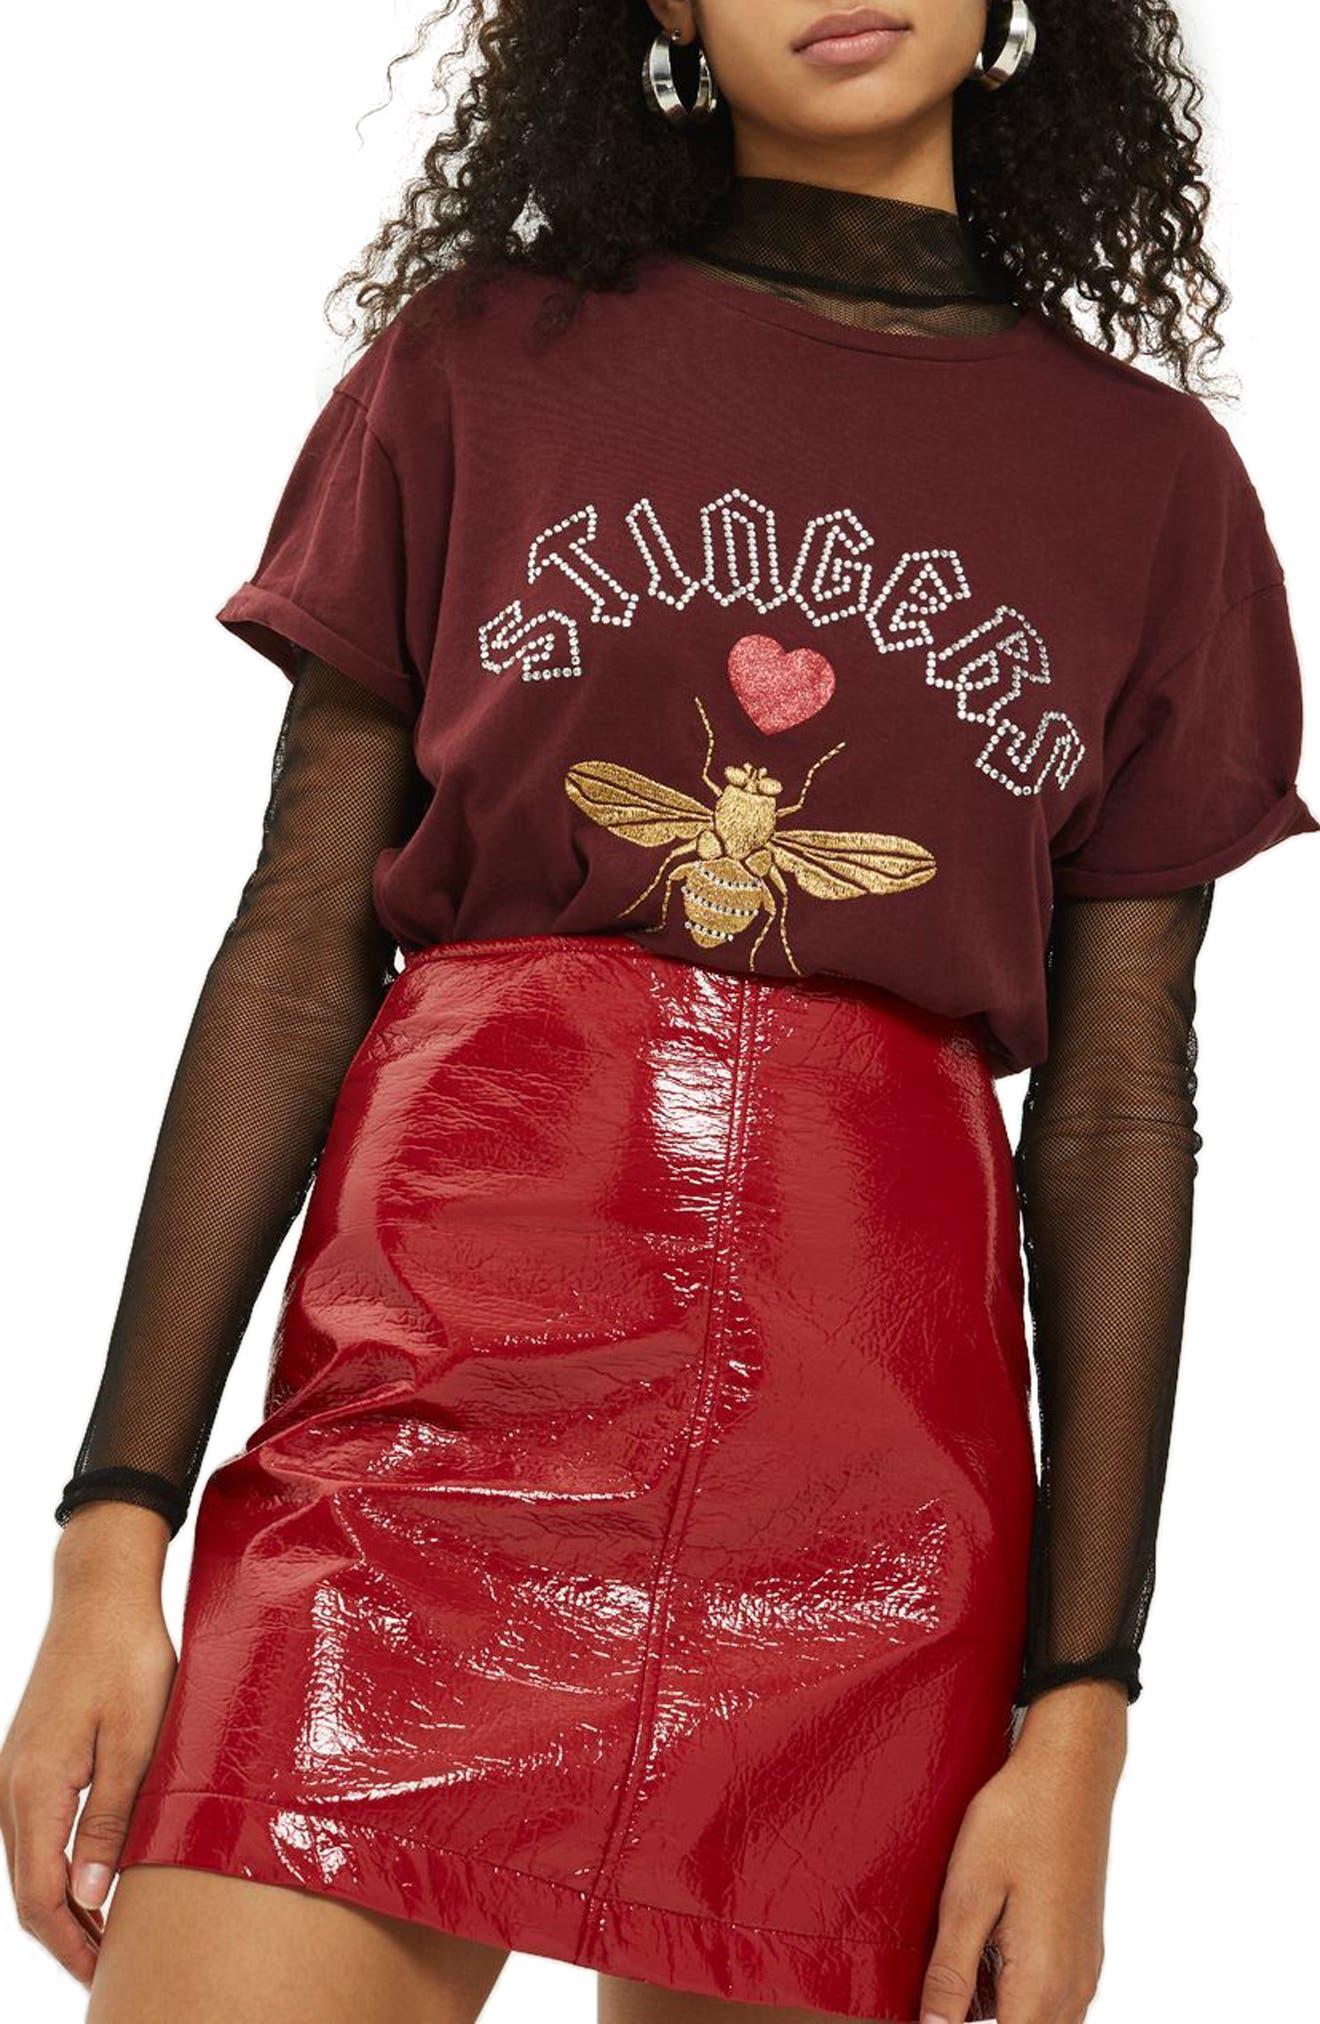 Stingers Embellished Tee,                         Main,                         color, Burgundy Multi